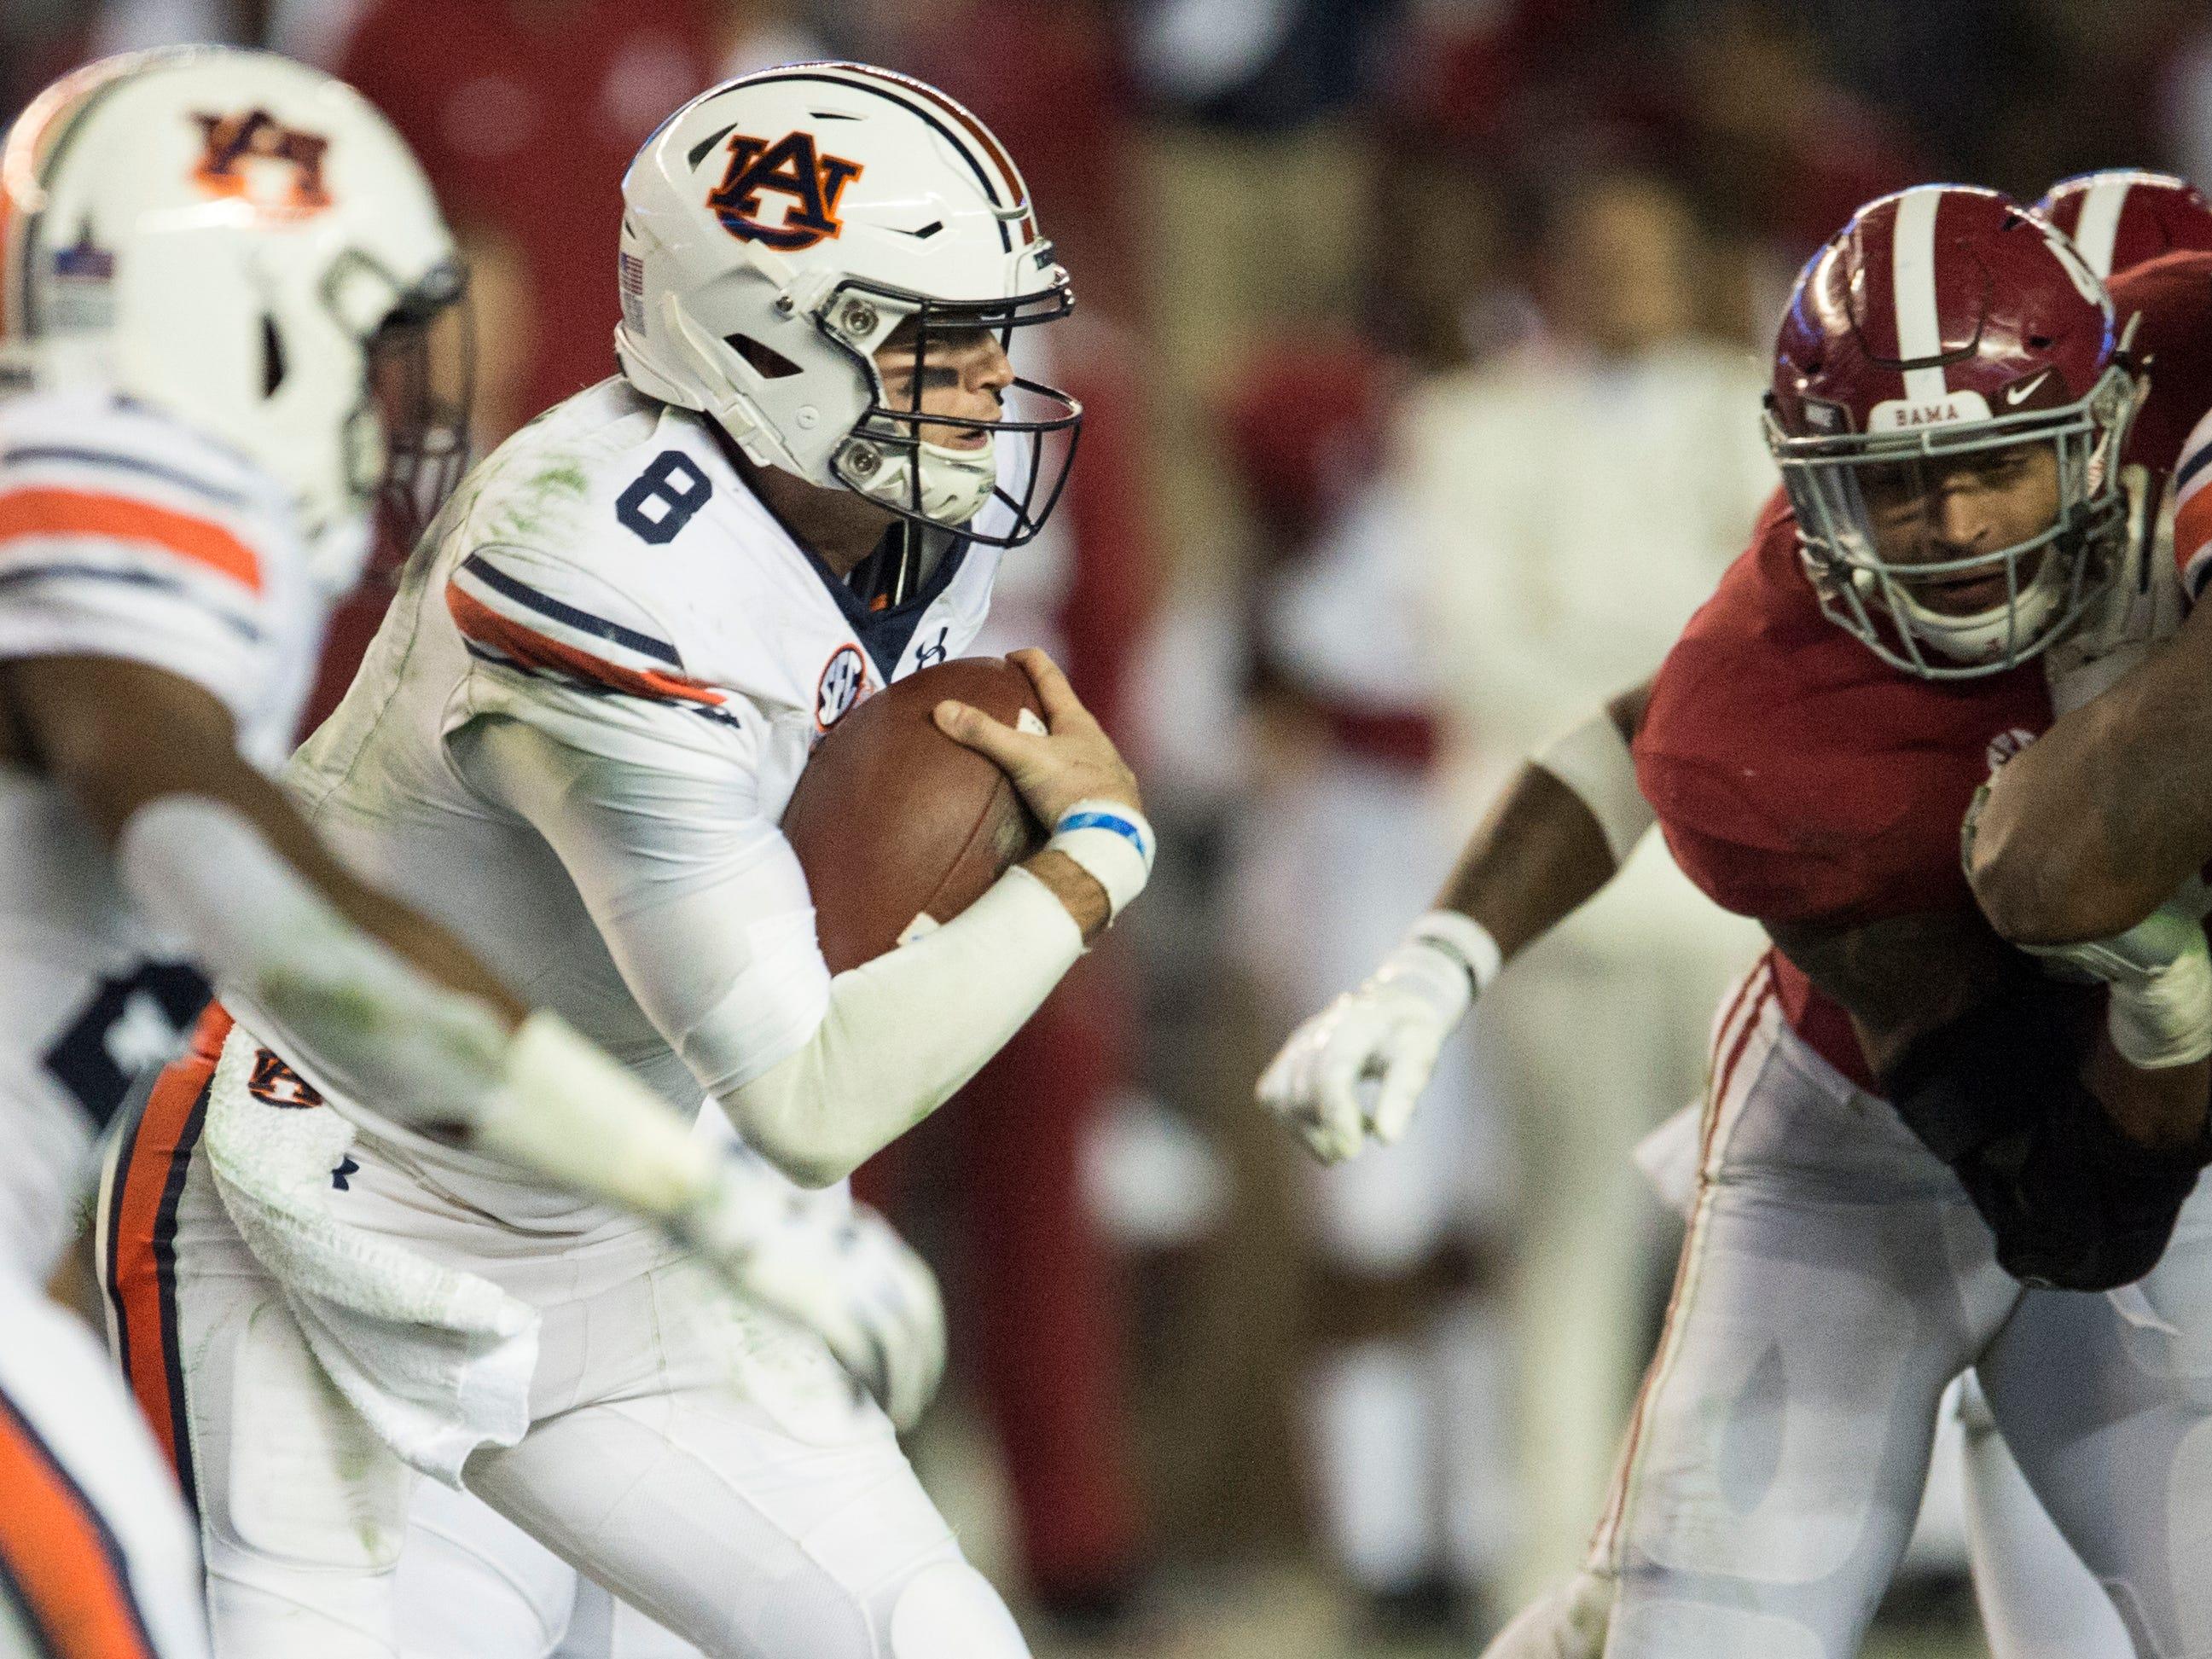 Auburn quarterback Jarrett Stidham (8) runs the ball against Alabama during the Iron Bowl at Bryant-Denny Stadium in Tuscaloosa, Ala., on Saturday, Nov. 24, 2018. Alabama defeated Auburn 52-21.